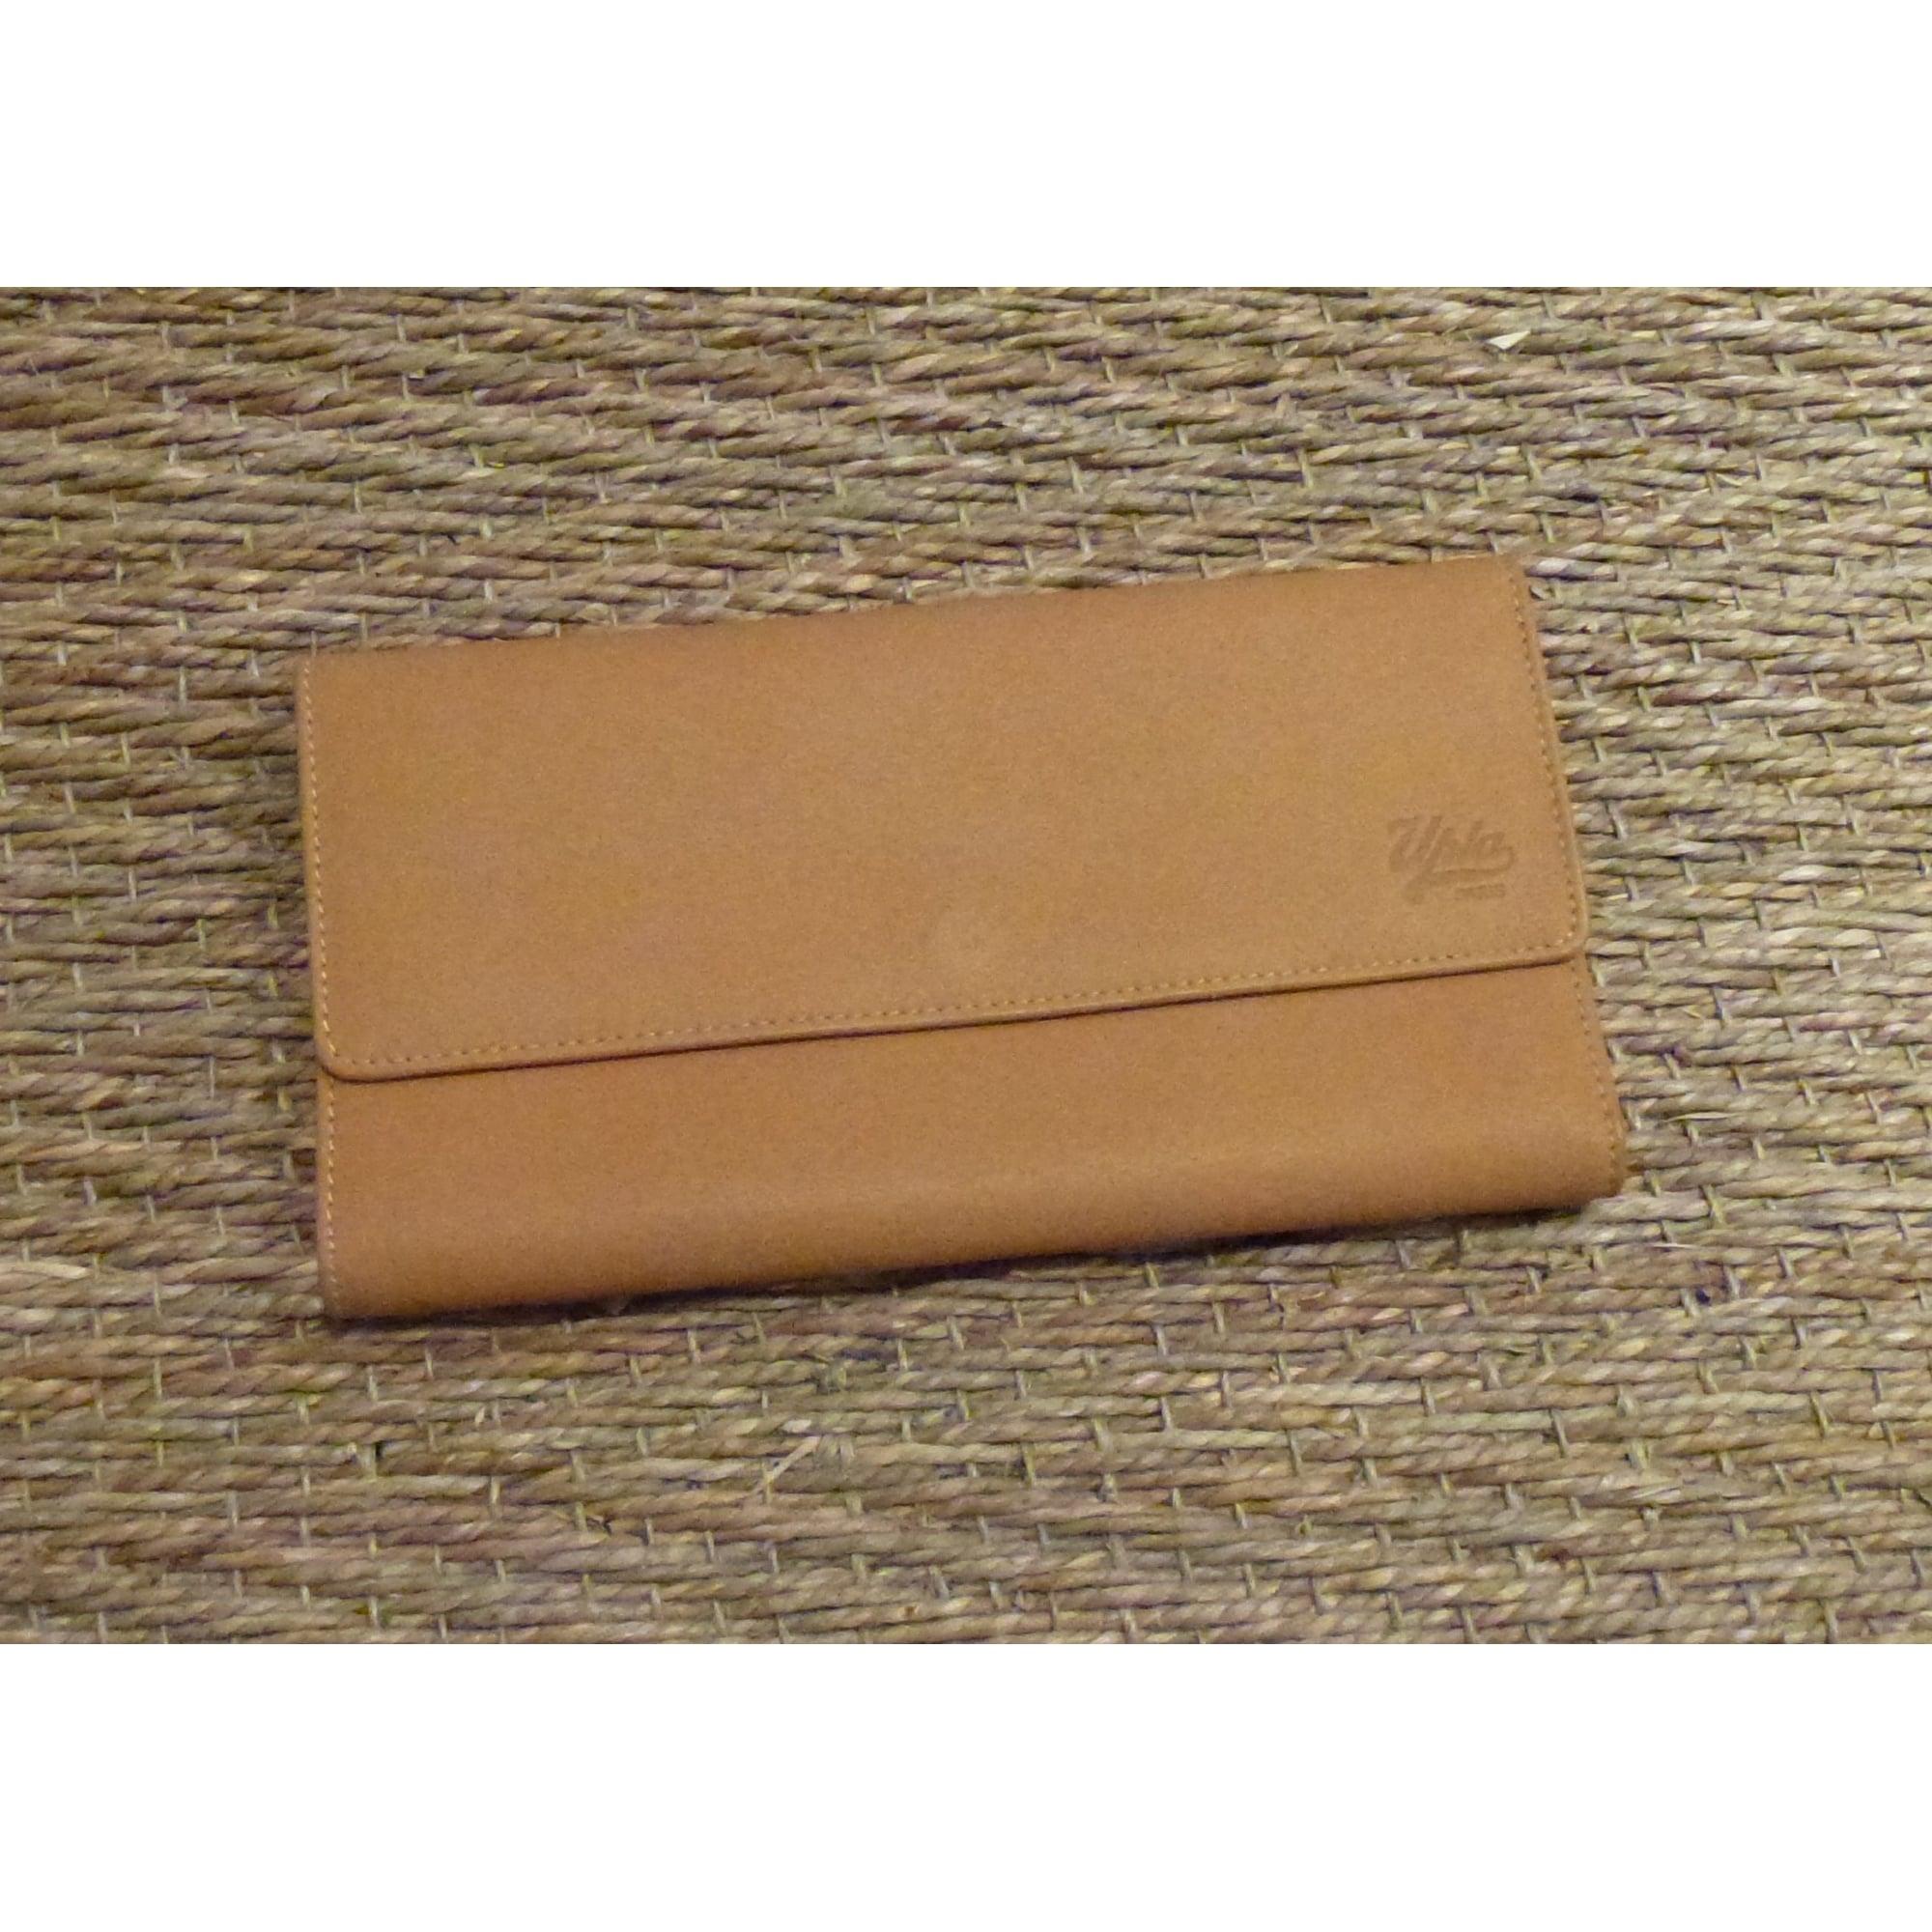 Portefeuille UPLA beige vendu par Shopping girl 7 - 5642262 901d2182b6c